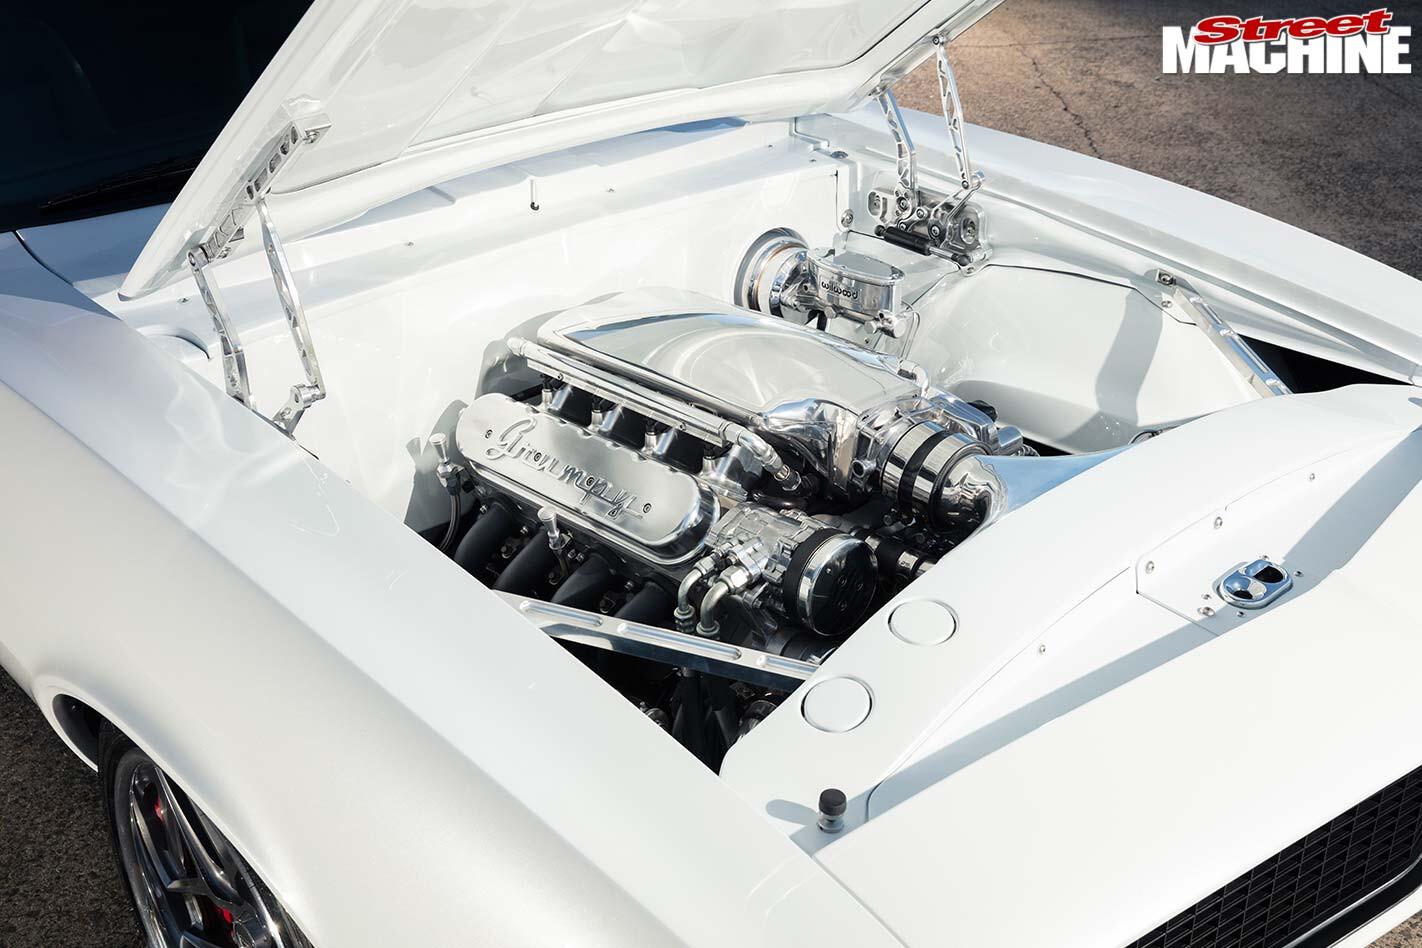 Chev Camaro engine bay